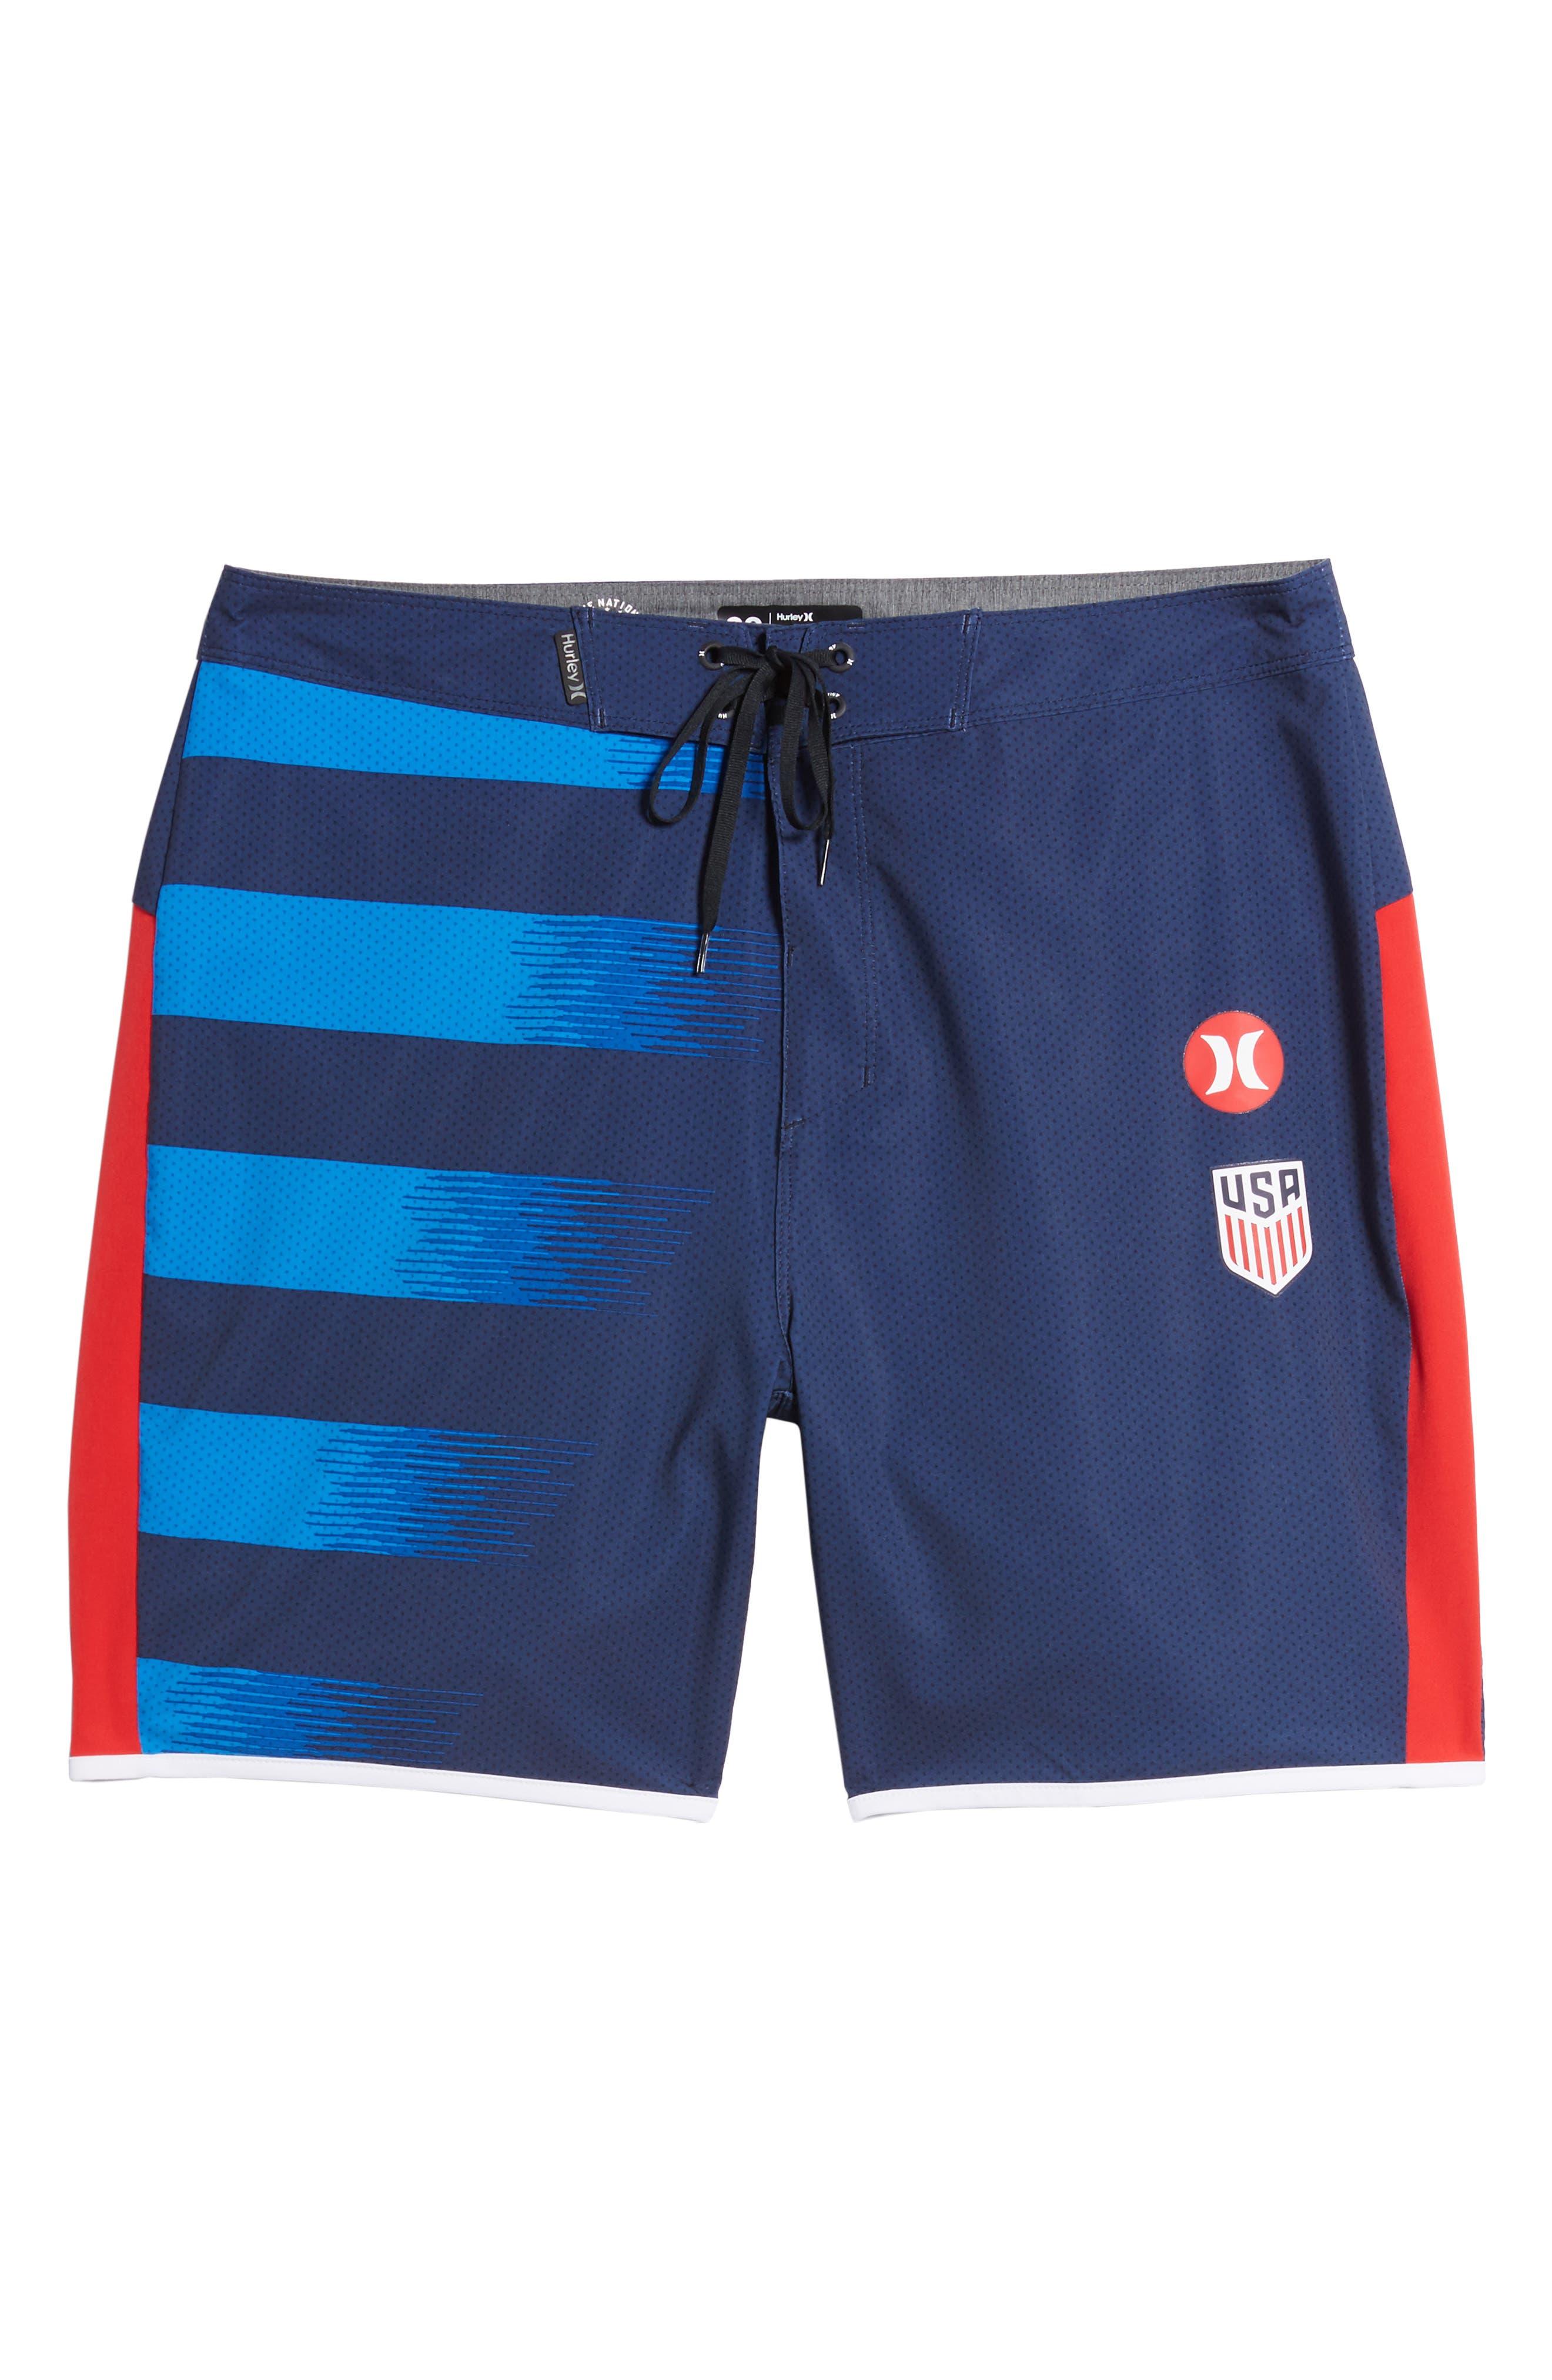 Phantom USA Away National Team Swim Shorts,                             Alternate thumbnail 6, color,                             410